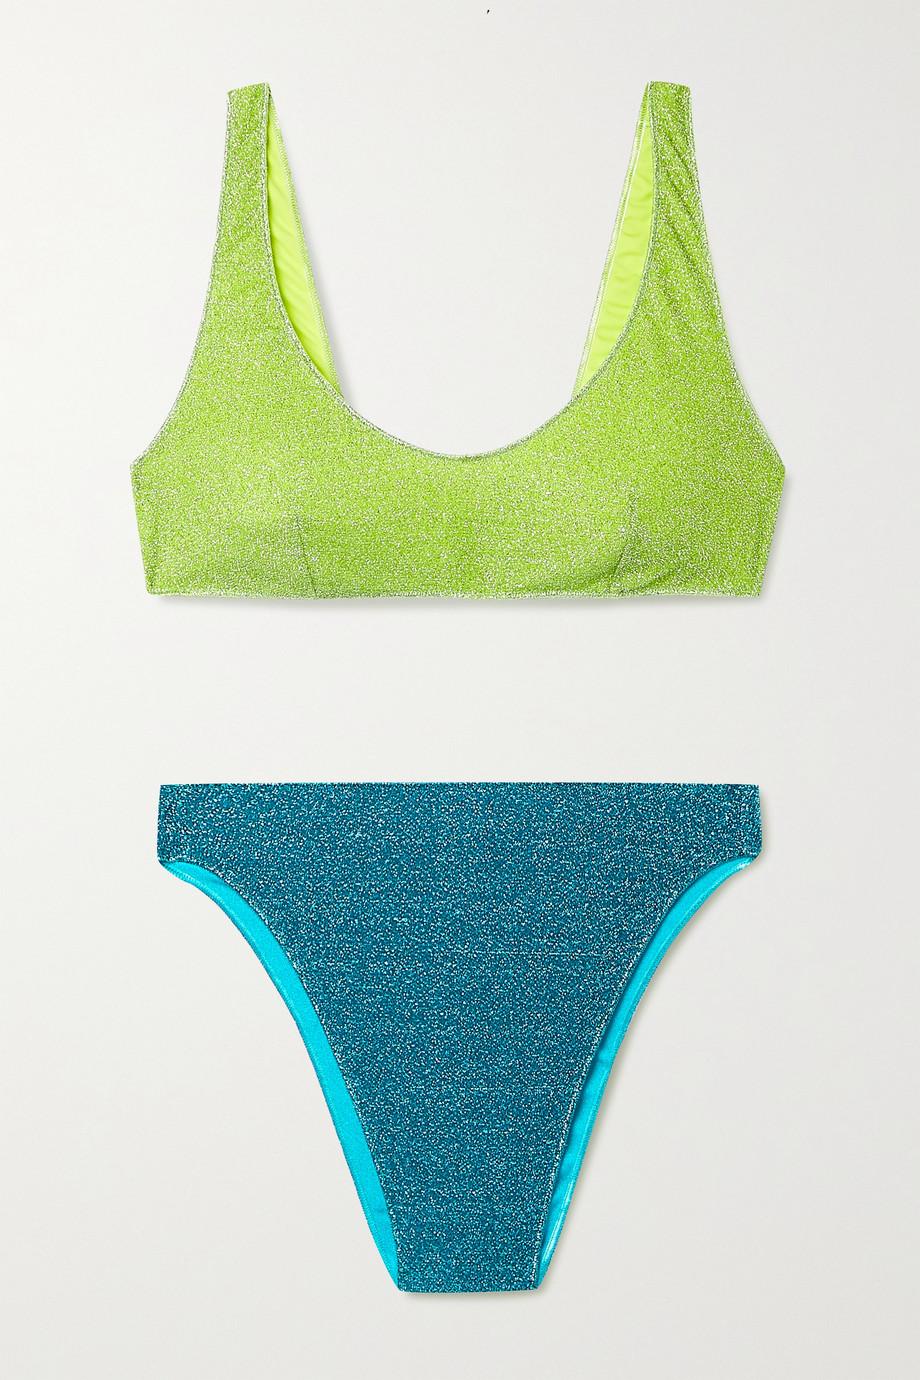 Oséree Lumière 90s zweifarbiger Bikini aus Stretch-Lurex®